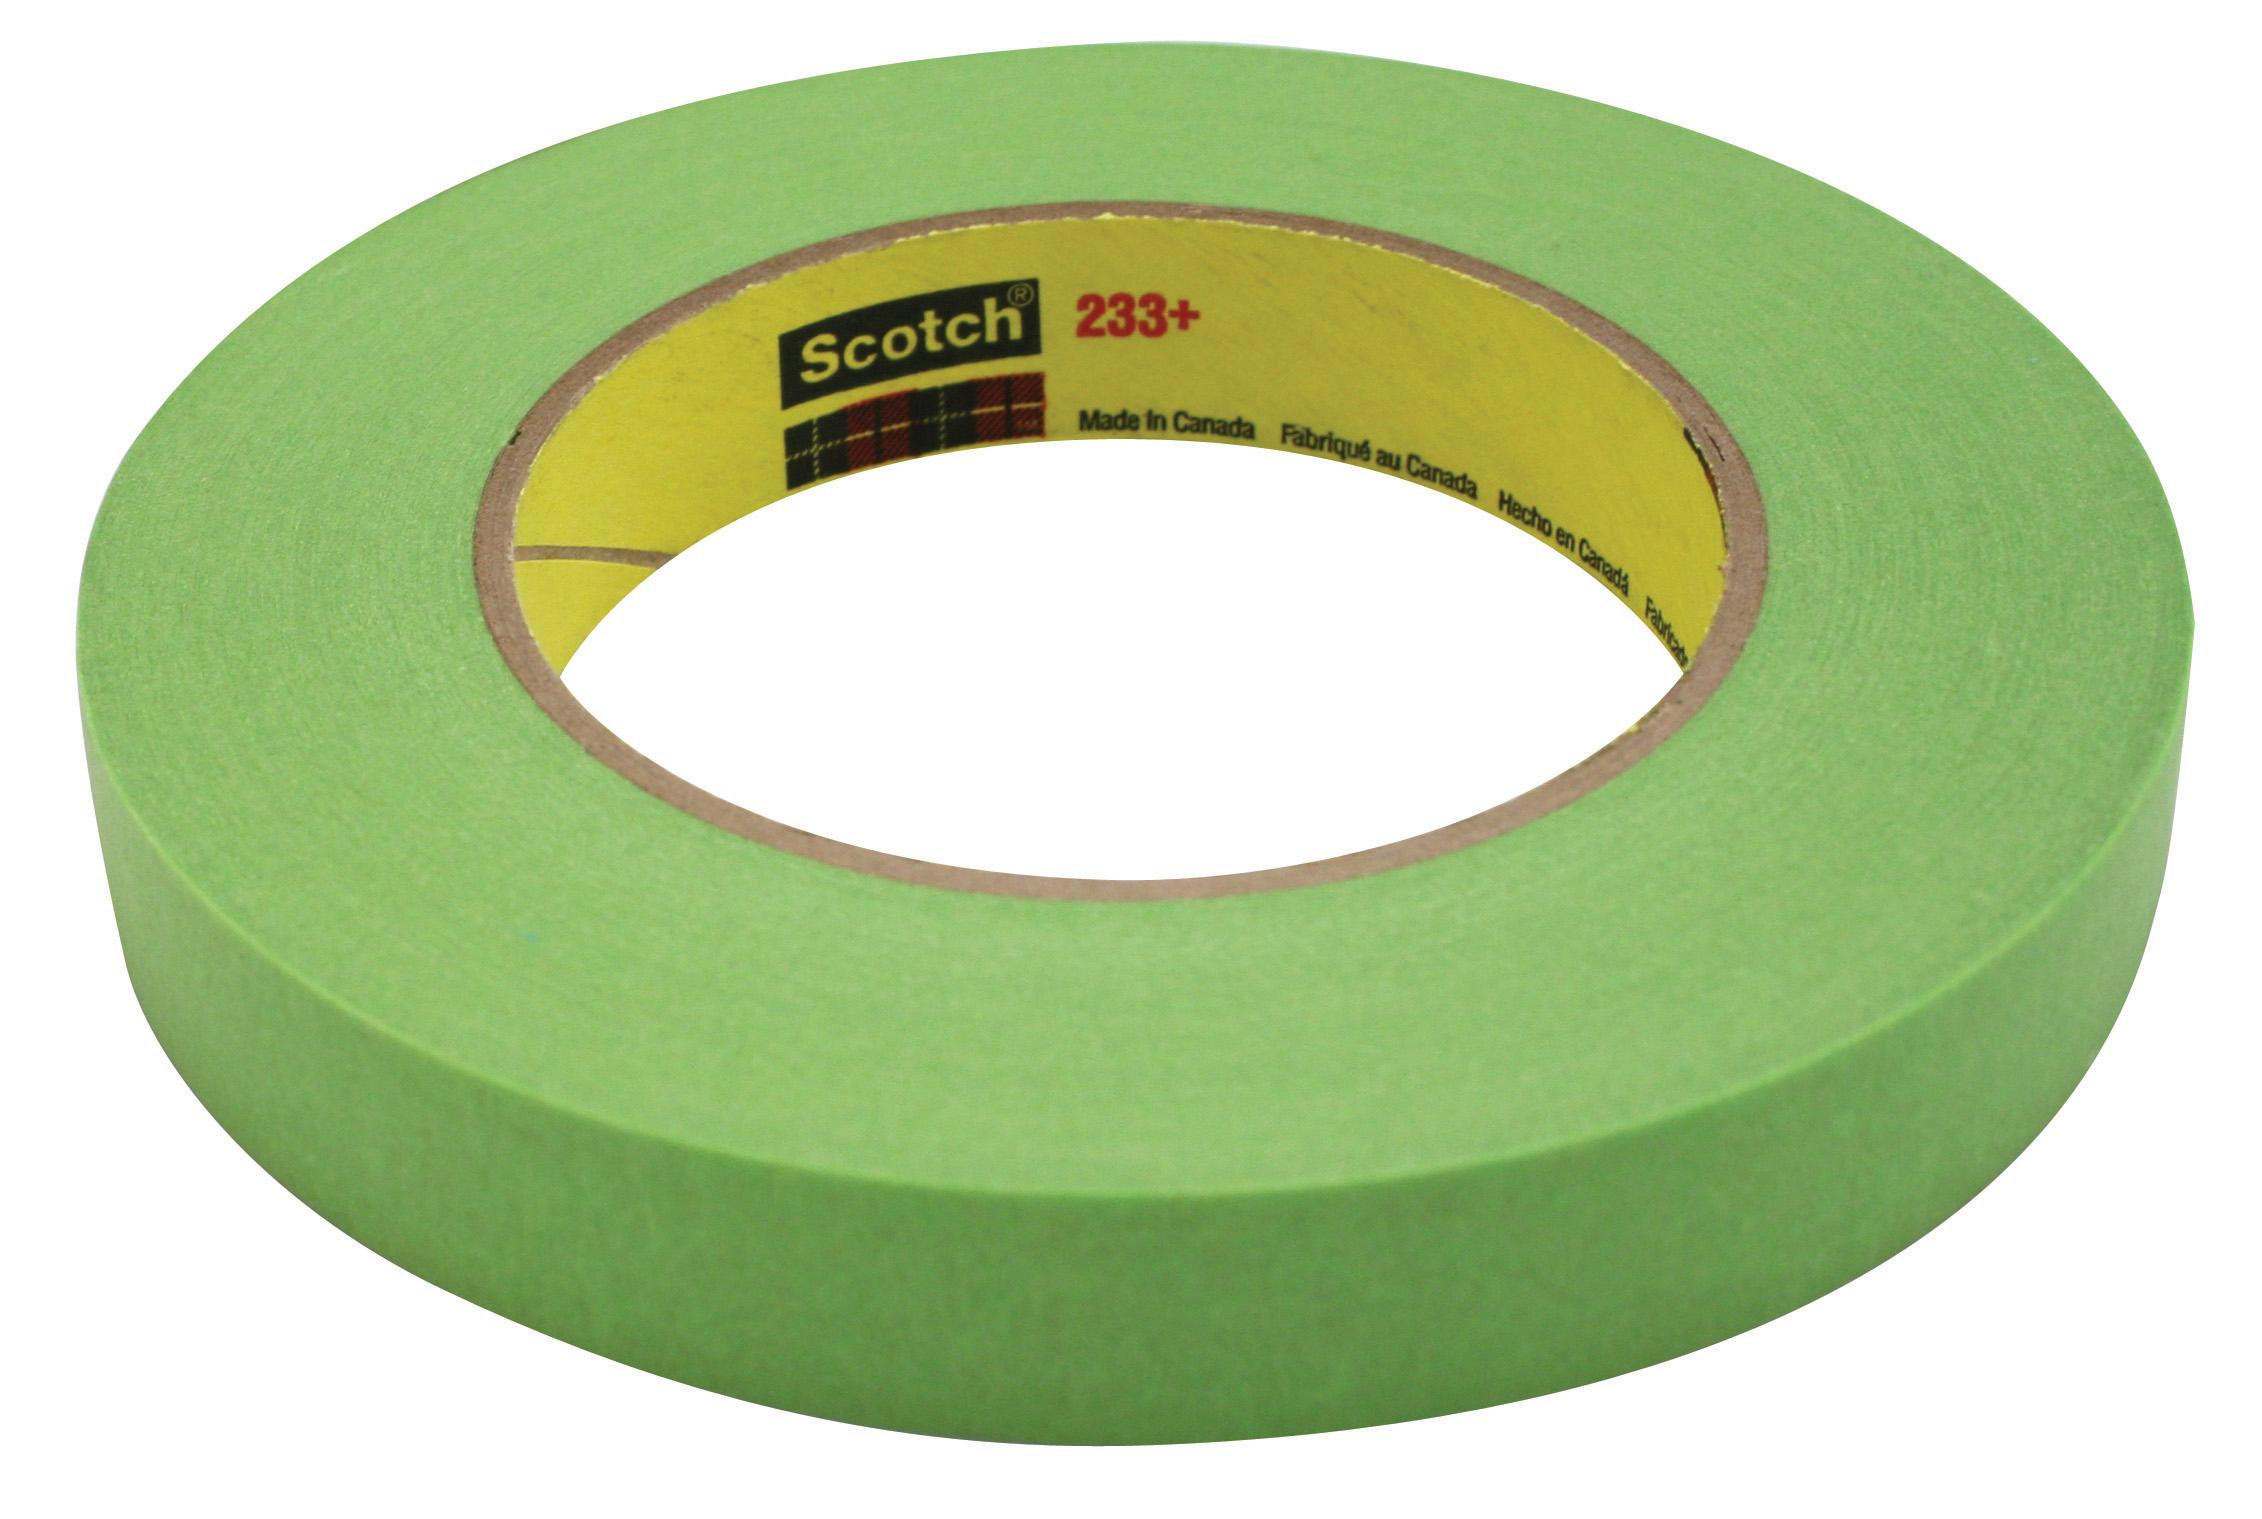 "Green 3M Masking Tape,Paper,Green,3//8/"" 233+"